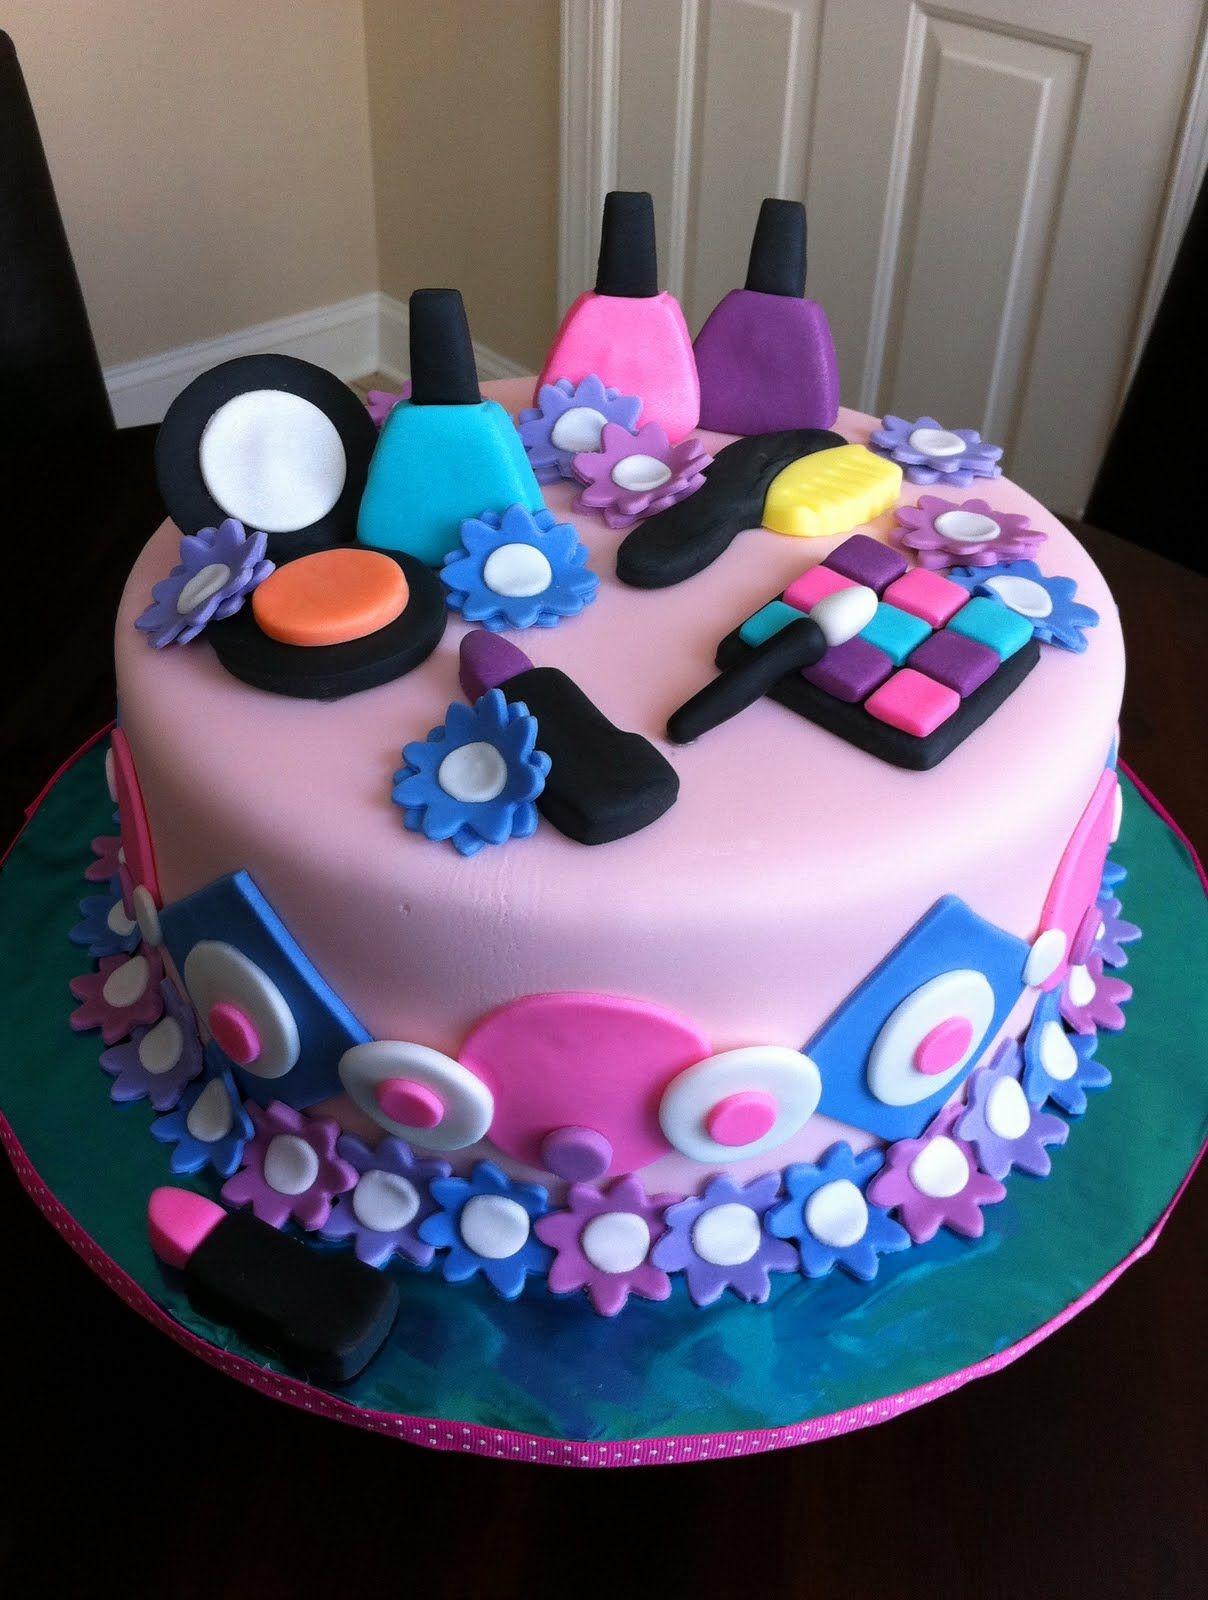 Spa Cake Sierras Gift Ideas Spa Party Cakes Spa Birthday Cake